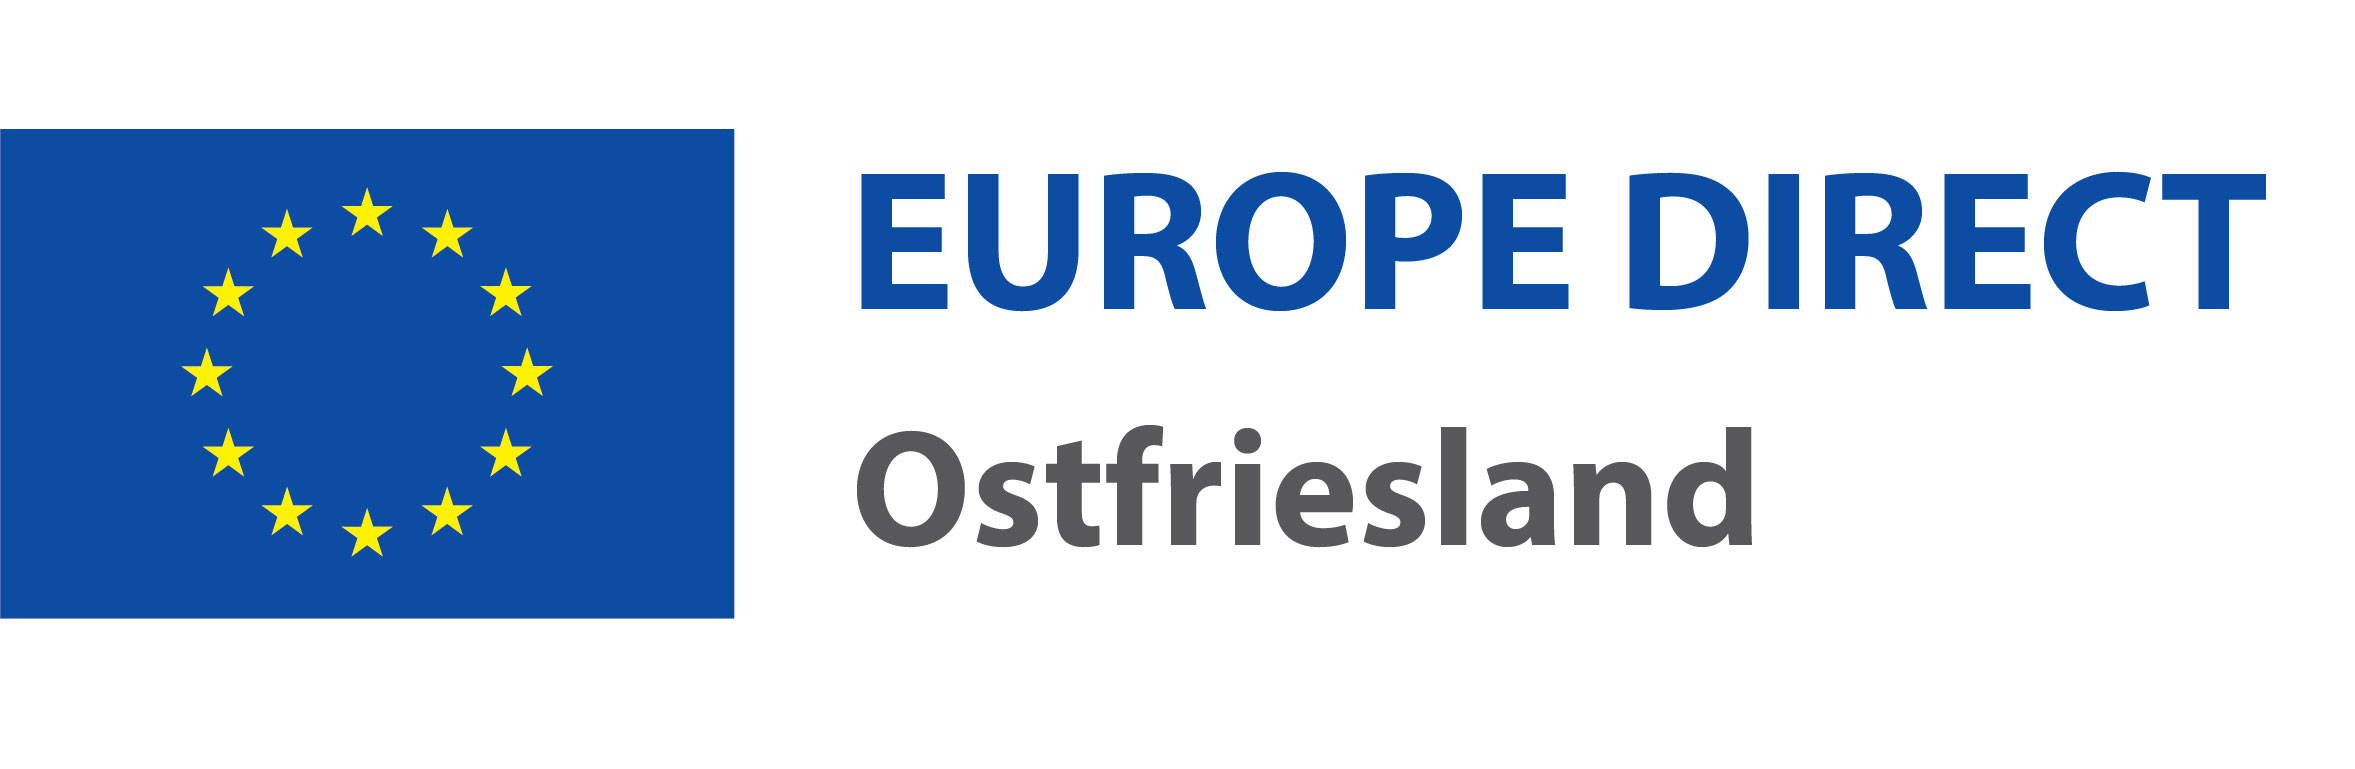 Logo Europe Direct Ostfriesland